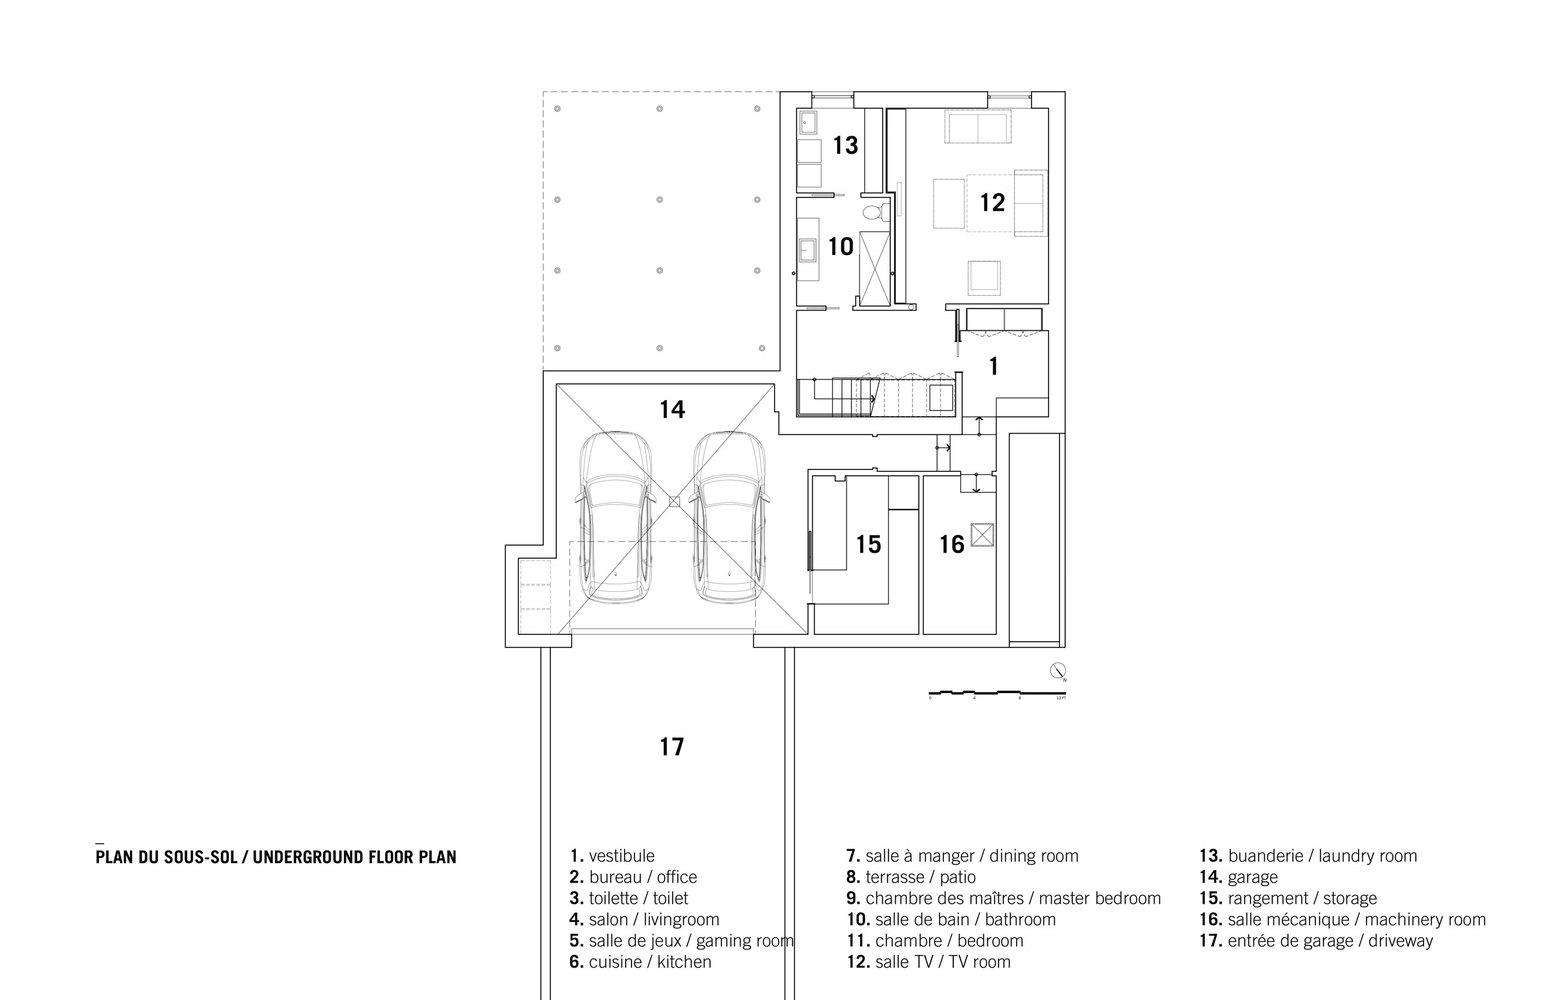 Cool Underground Floor Plan. Bic Residence Underground Floor Plan Gallery of  NatureHumaine 16